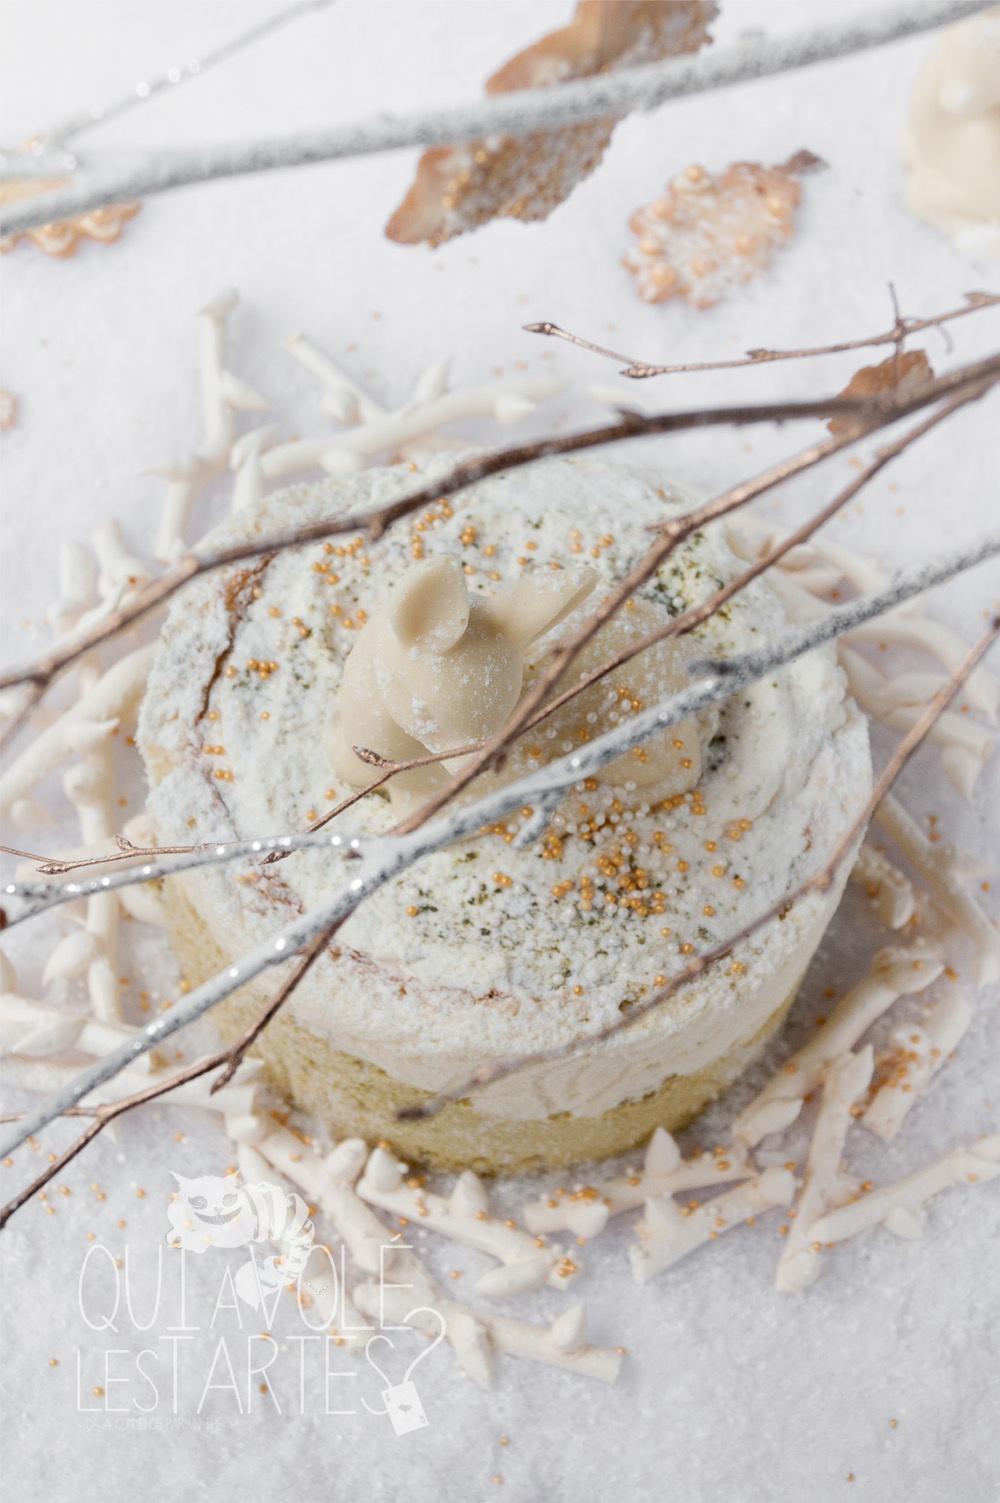 Nara 2 - charlotte sans gluten MatchaYuzu - Studio 2 créaion - Qui a volé les tartes